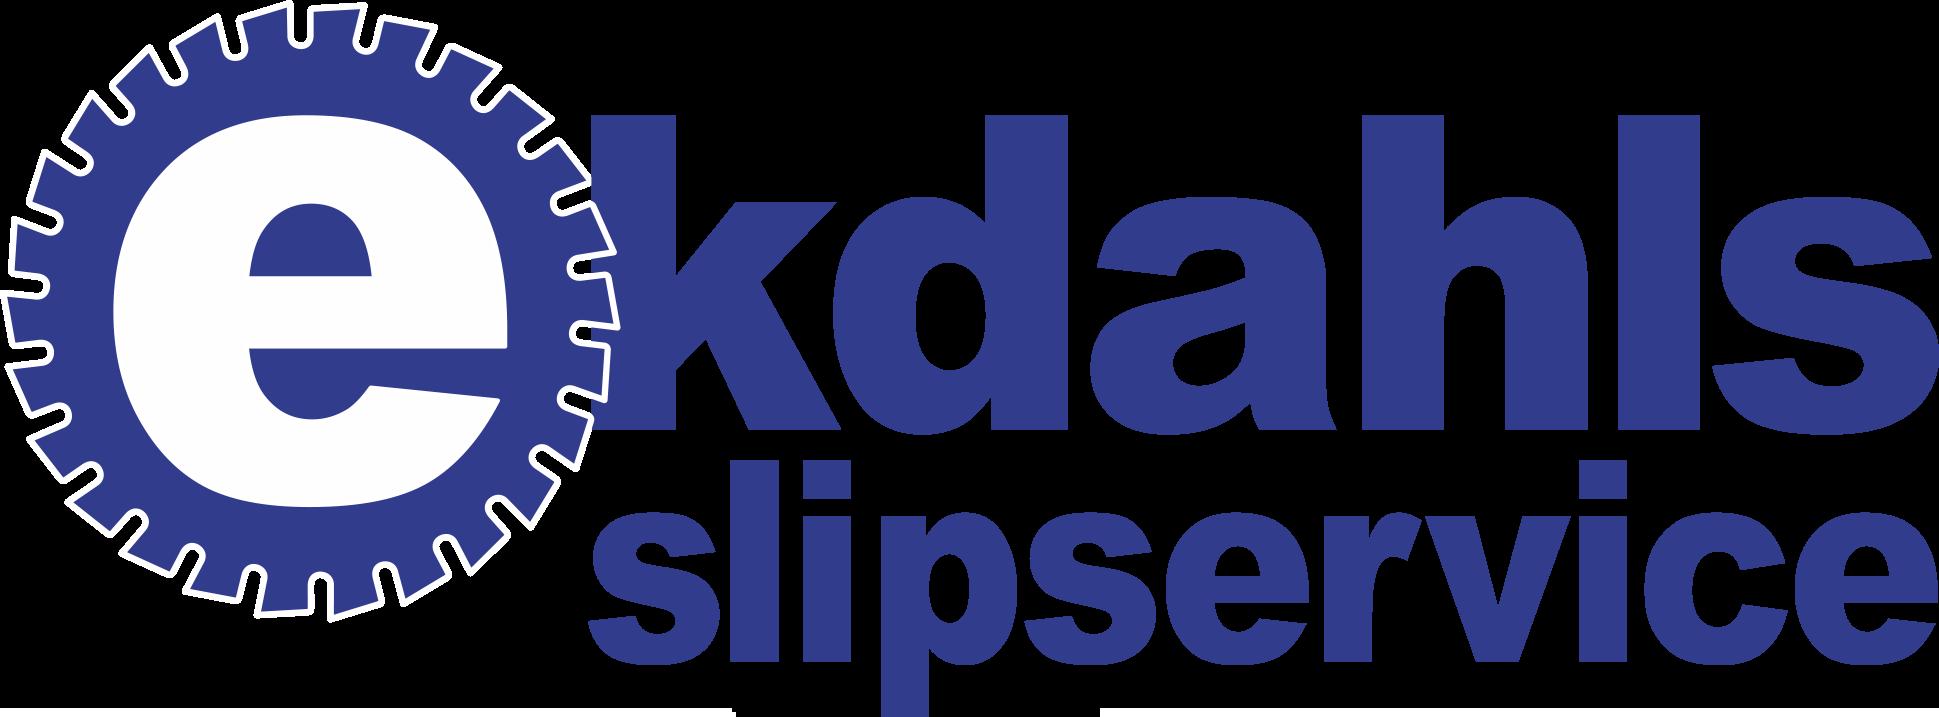 Ekdahls slipservice